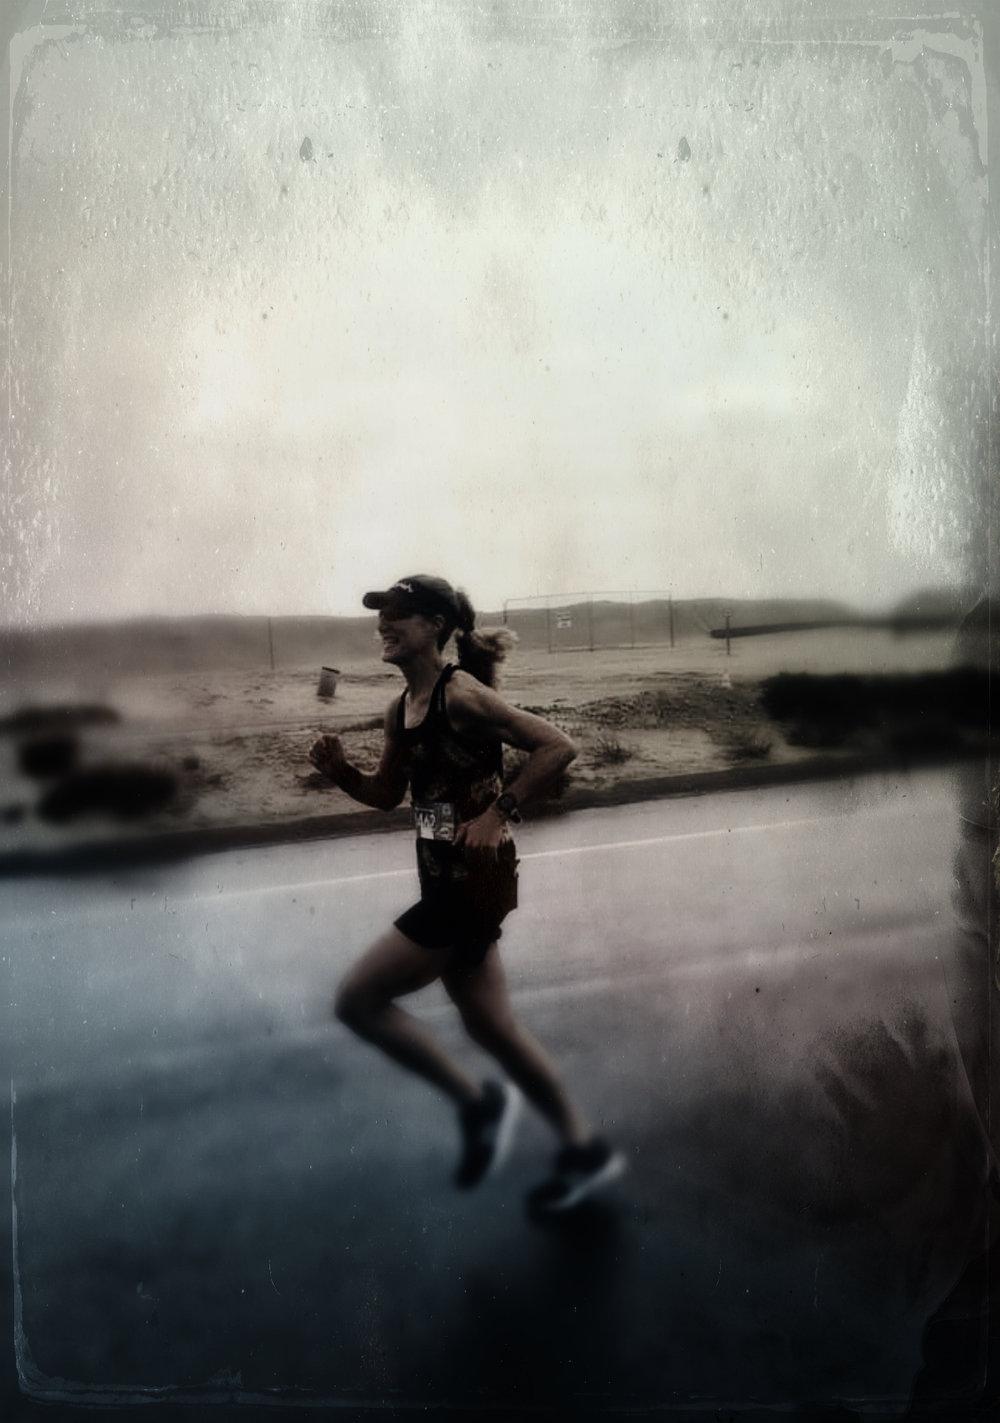 Mile 9ish, Surf City Half marathon. Photo credit: Michele Landry